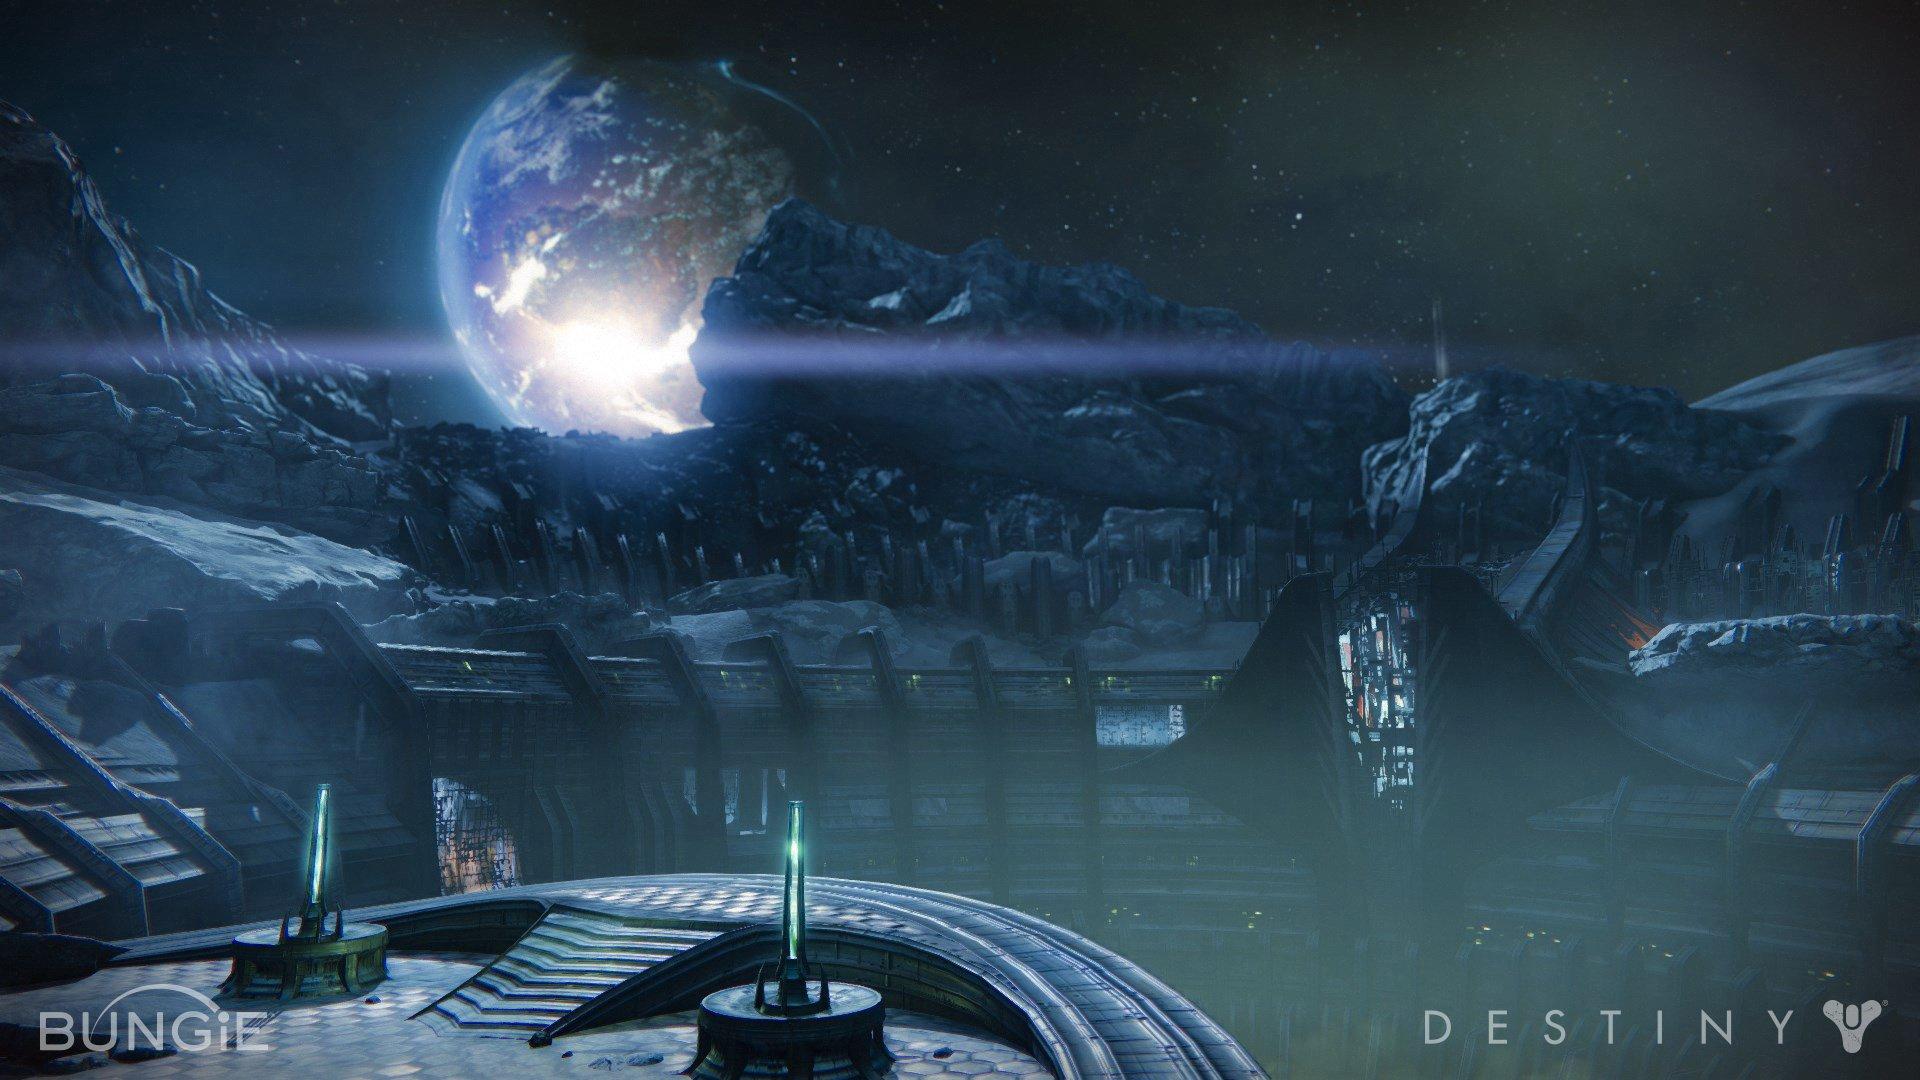 Video Game - Destiny  Destiny (Video Game) Wallpaper